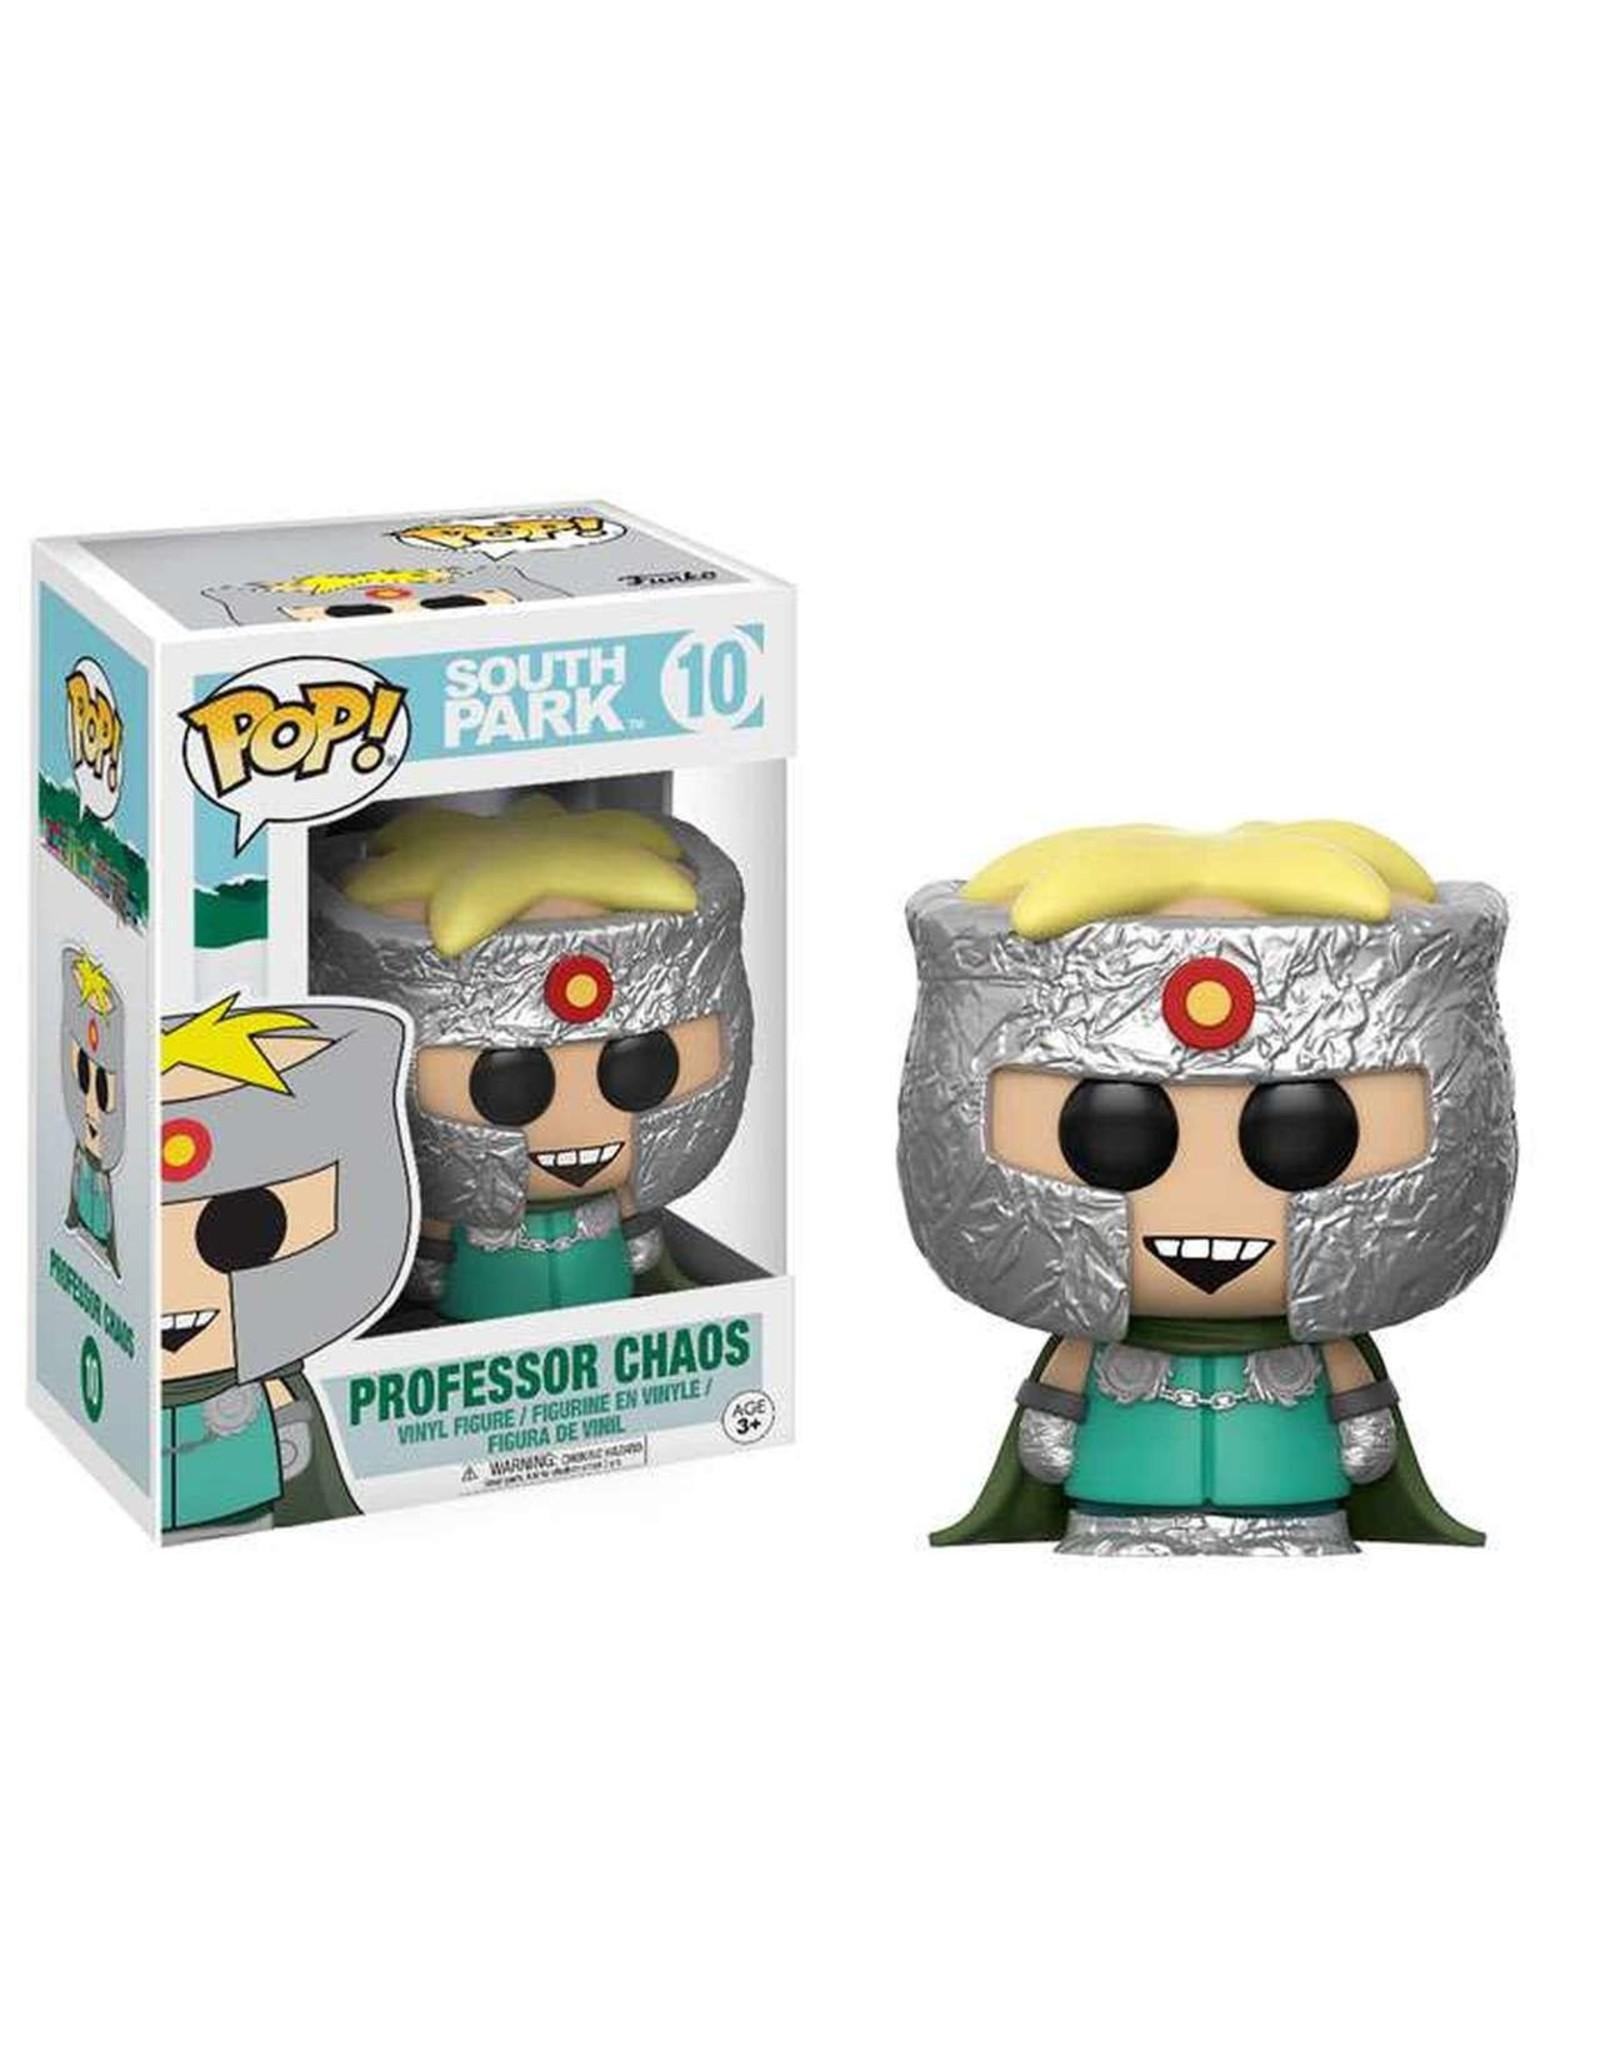 Funko Pop! Funko Pop! South Park nr010 - Professor Chaos